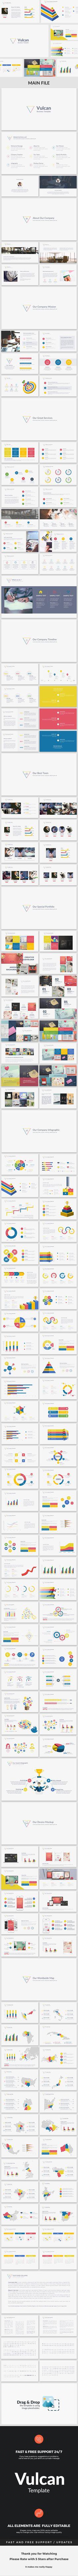 Vulcan Business Powerpoint Template. Download here: https://graphicriver.net/item/vulcan-business-powerpoint-template/17506743?ref=ksioks